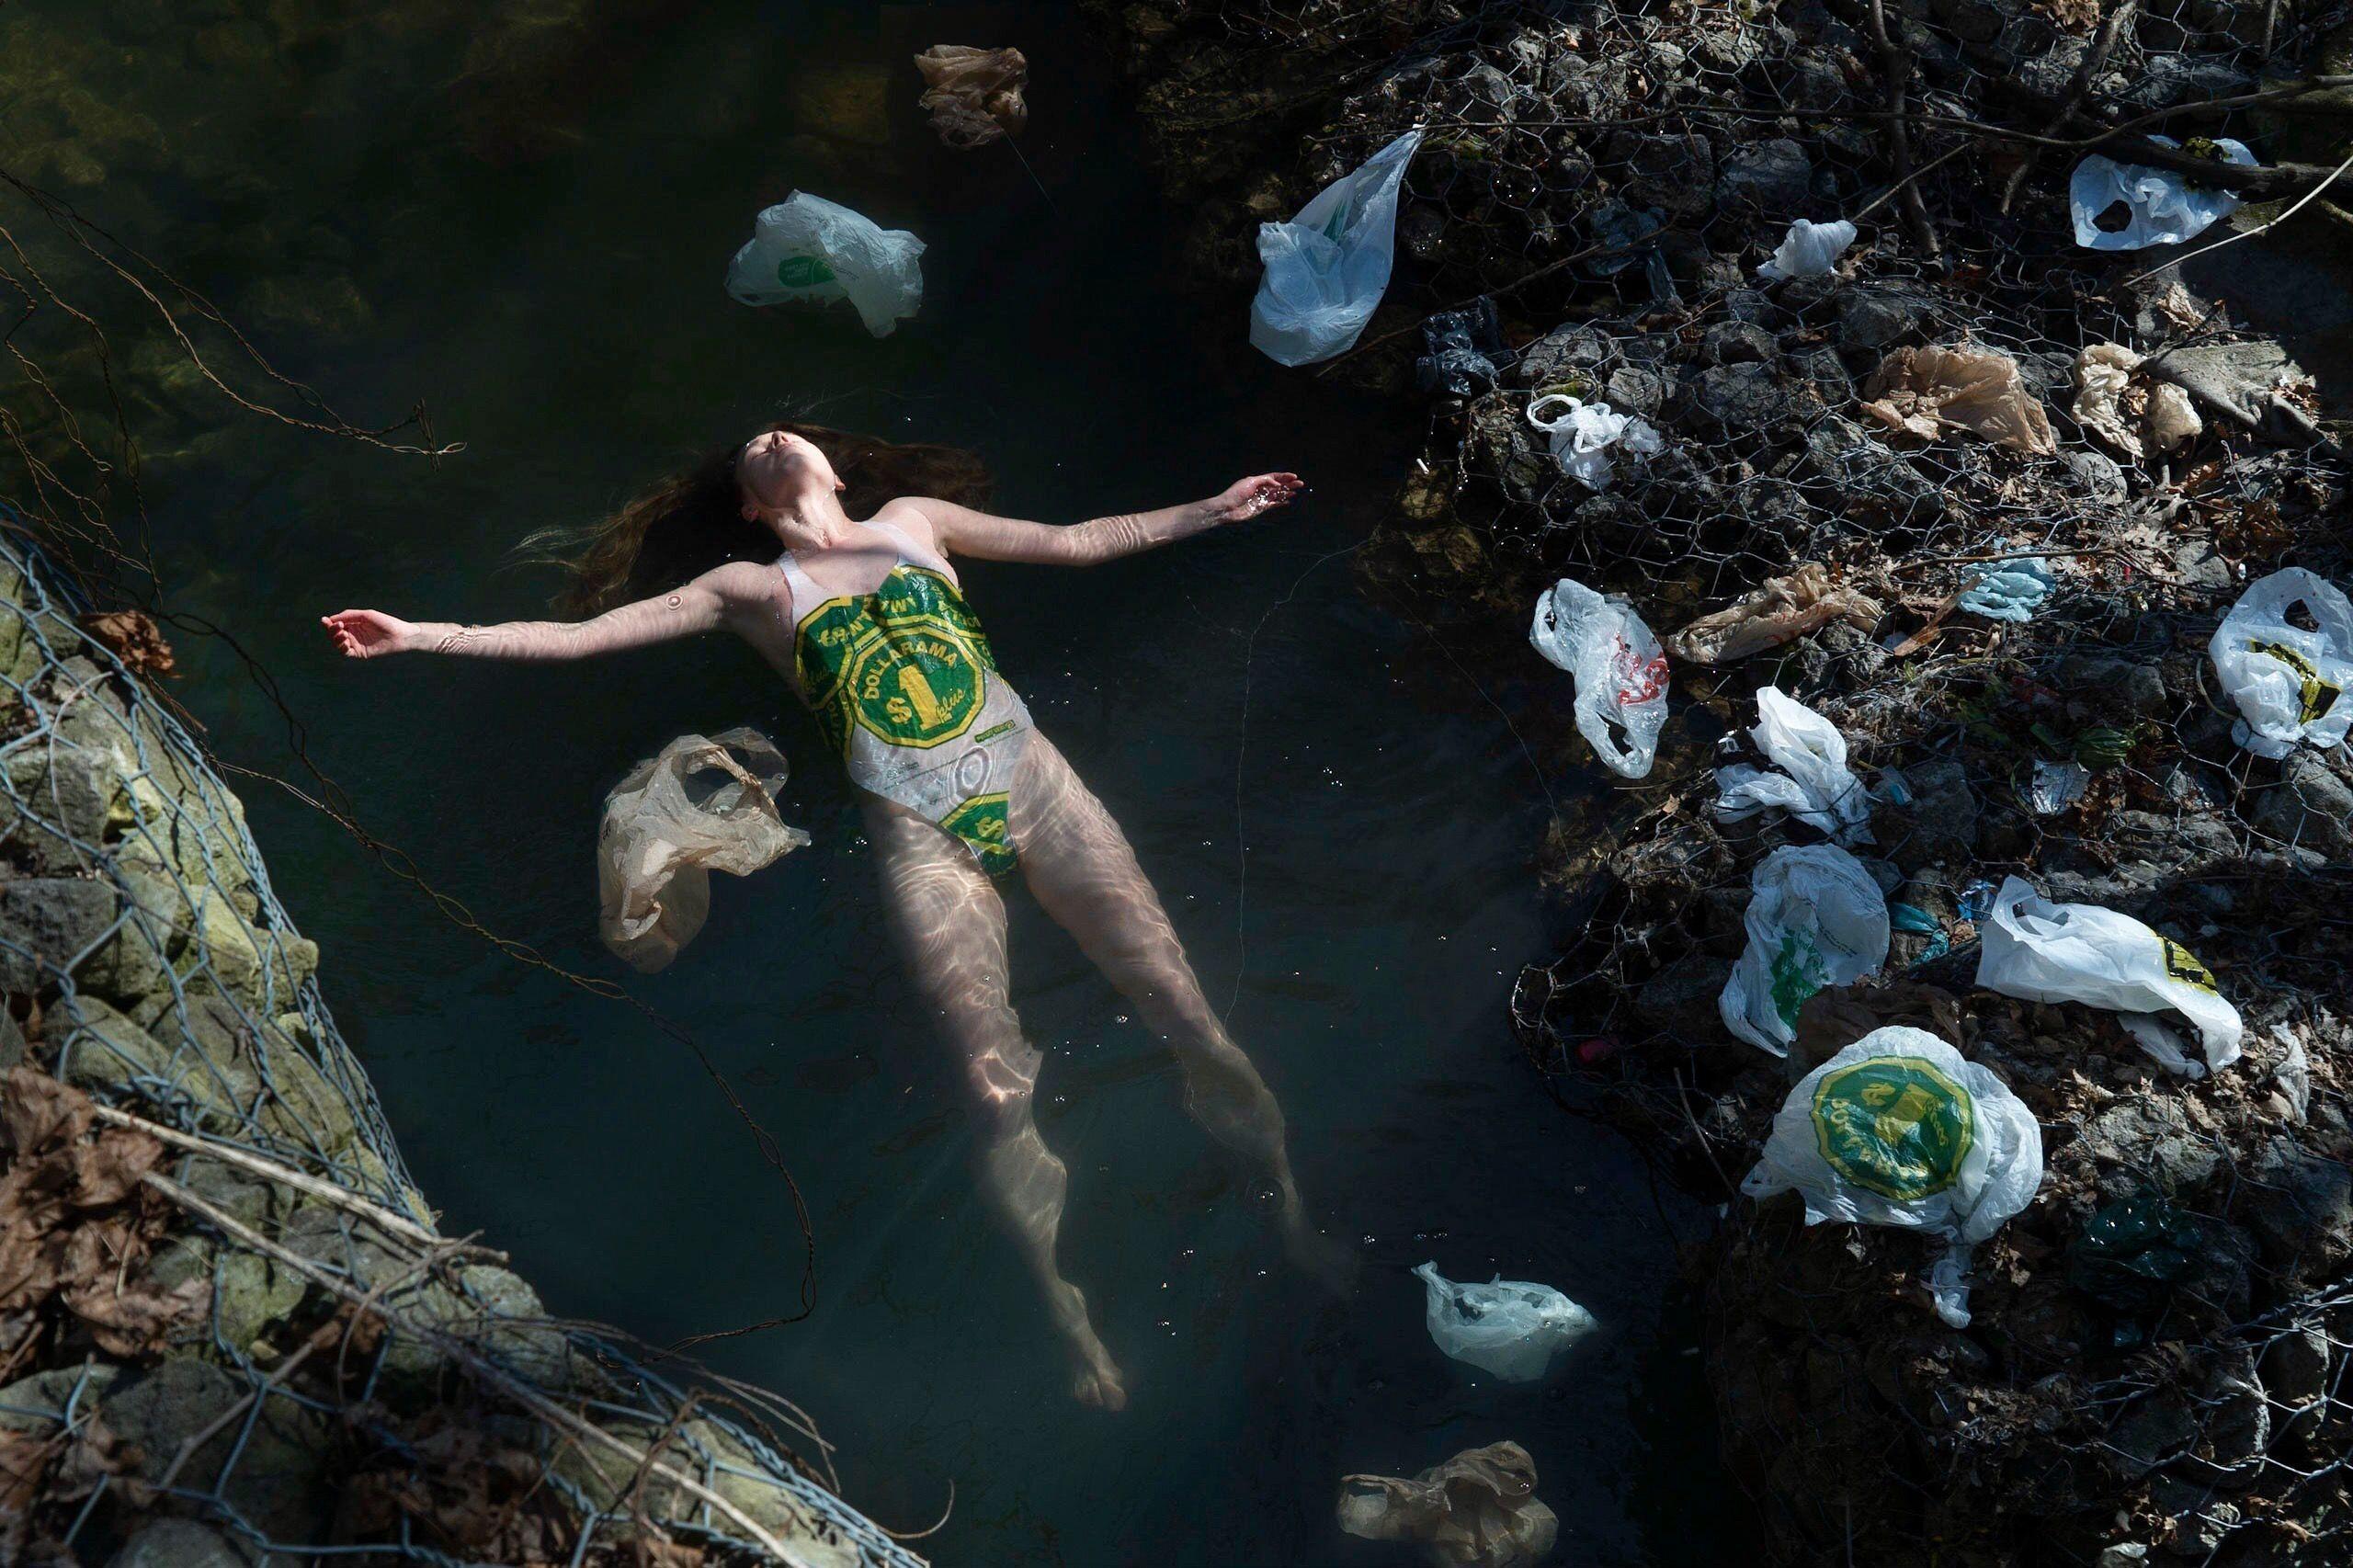 Galeria de fotos: Os perigos do plástico no meio ambiente